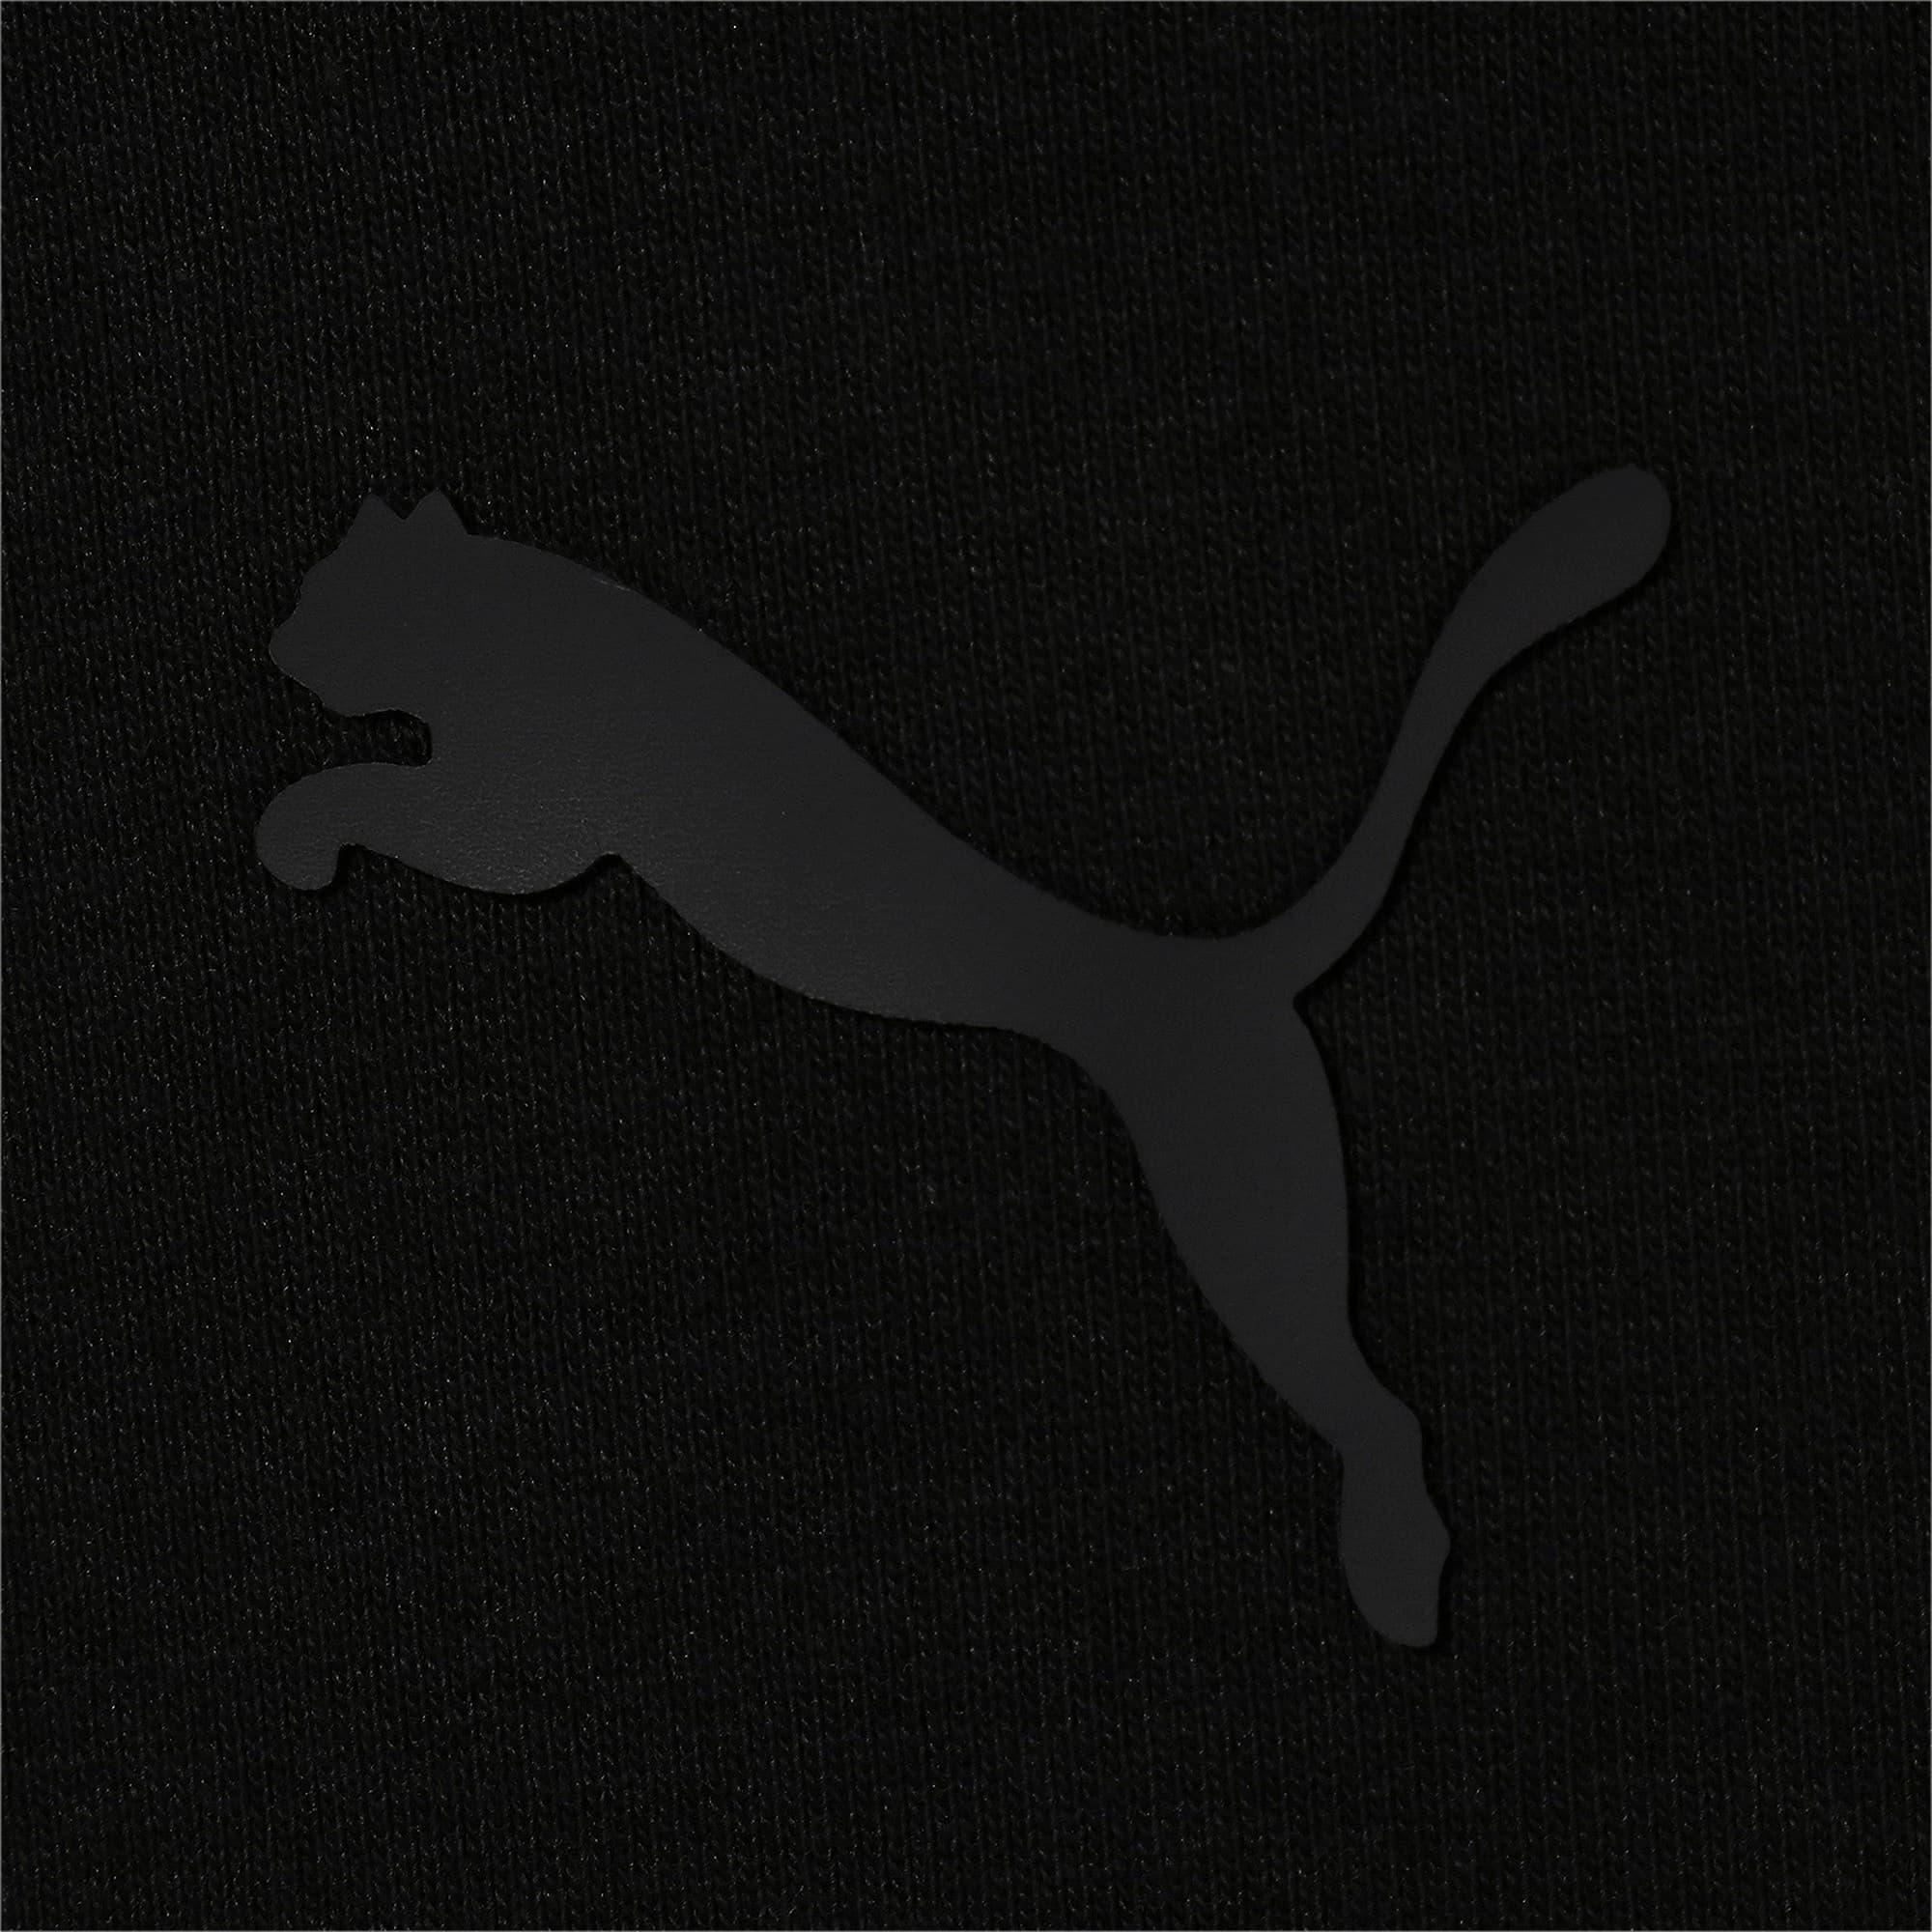 Thumbnail 4 of フェラーリ スウェット パンツ CC, Puma Black, medium-JPN